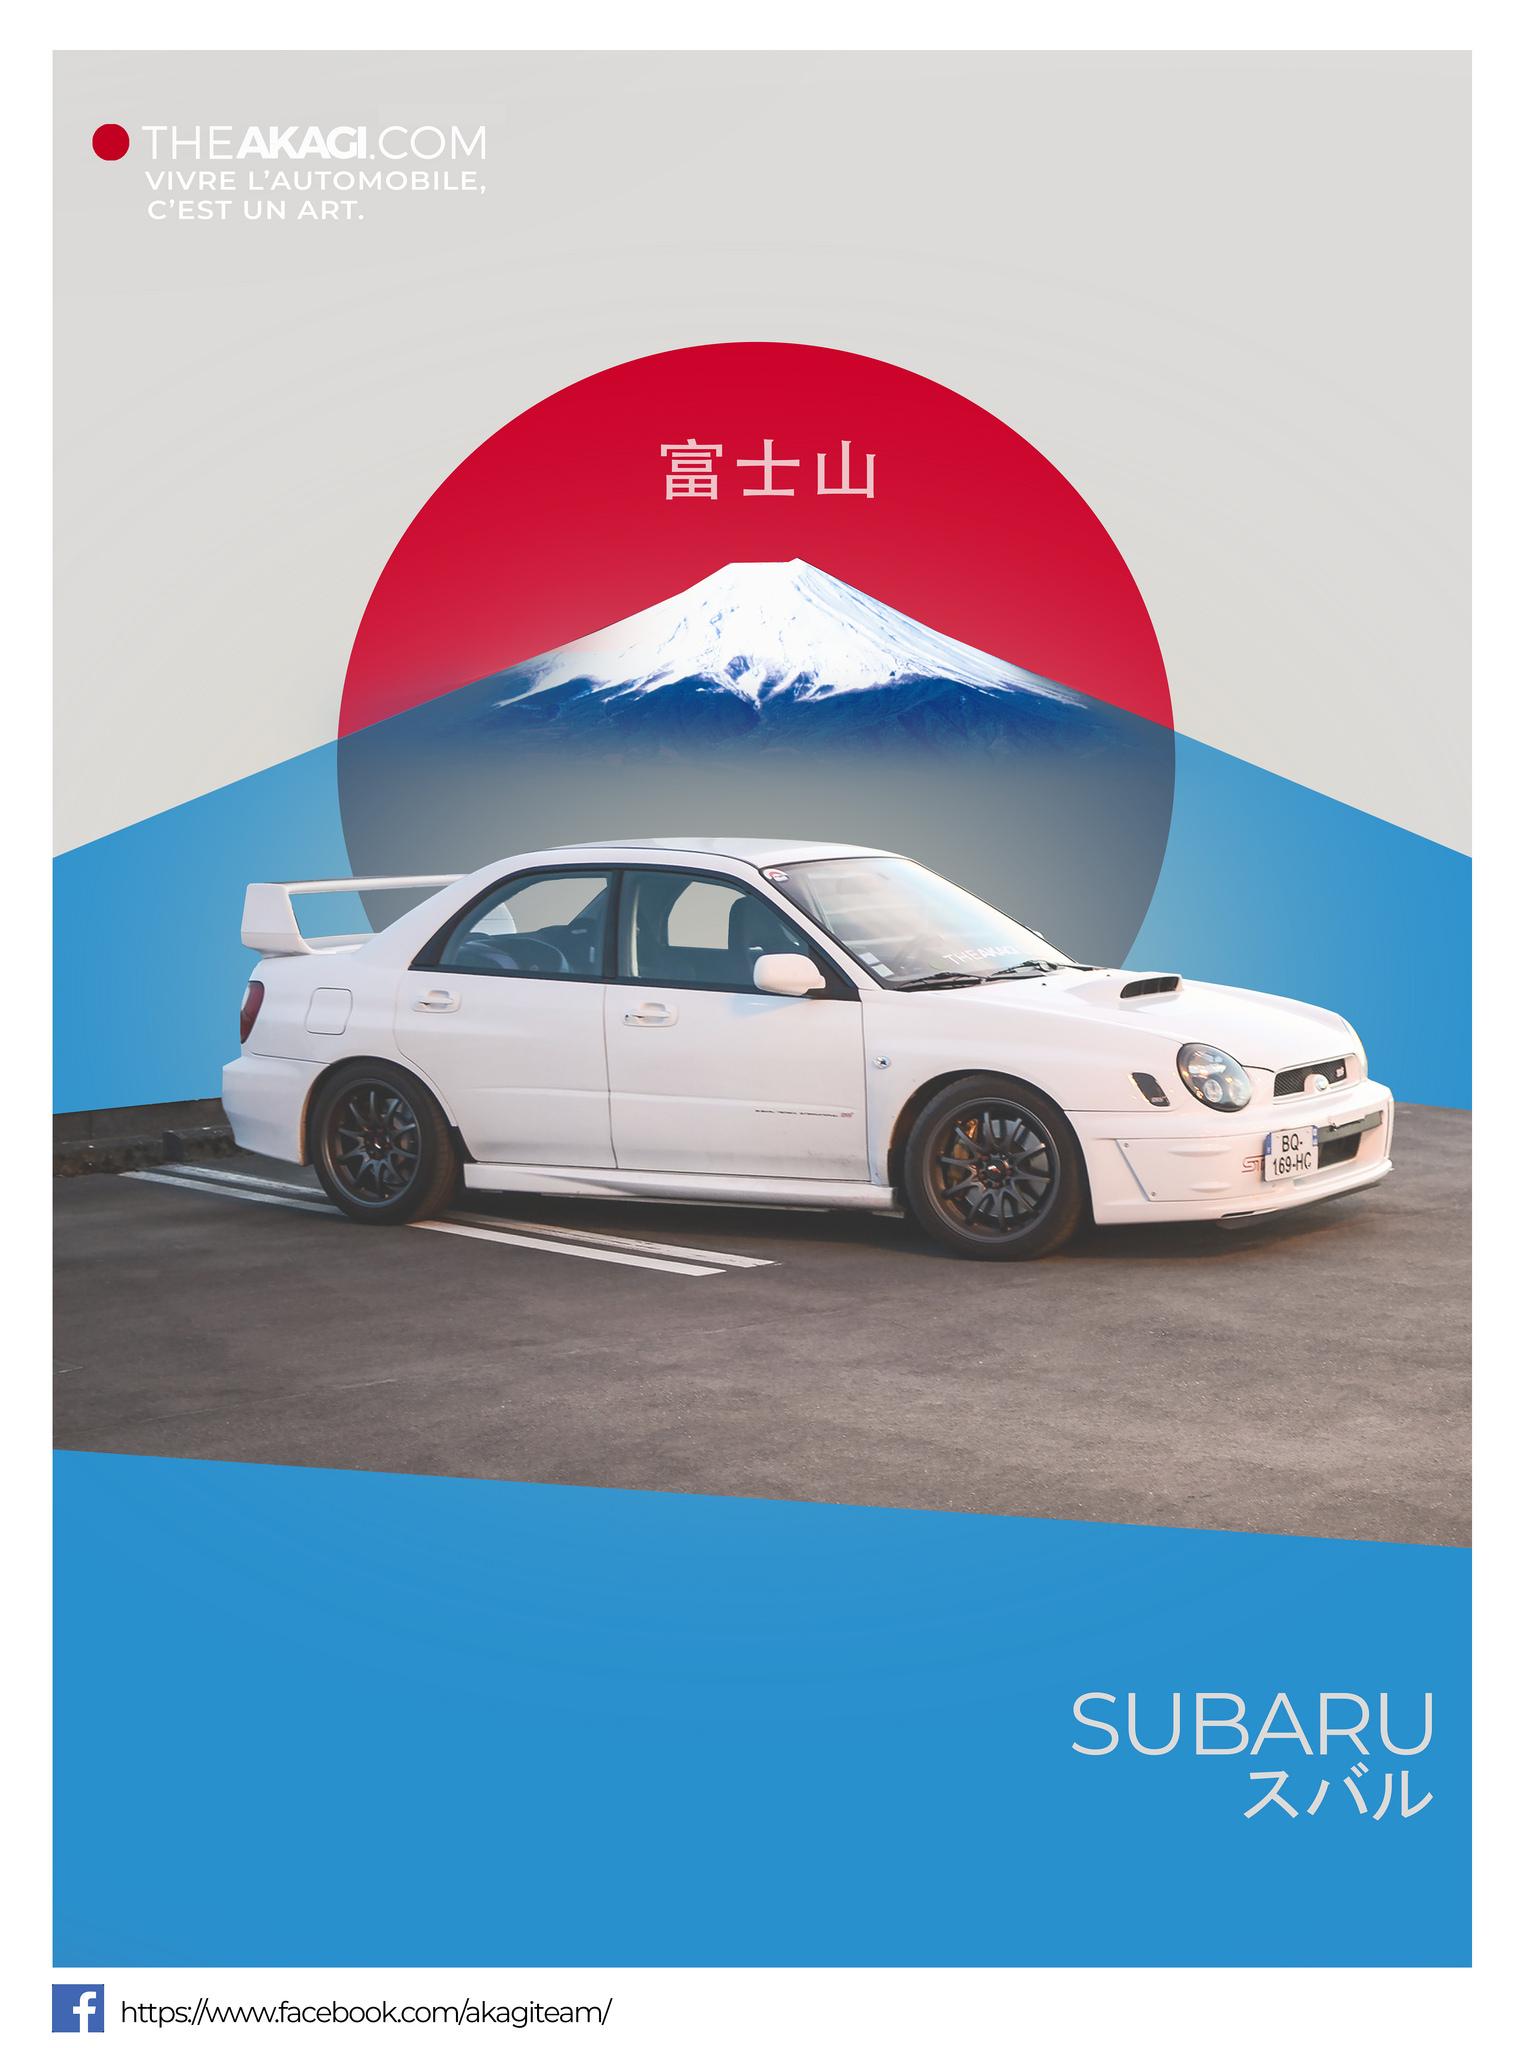 Cadre Subaru Japon